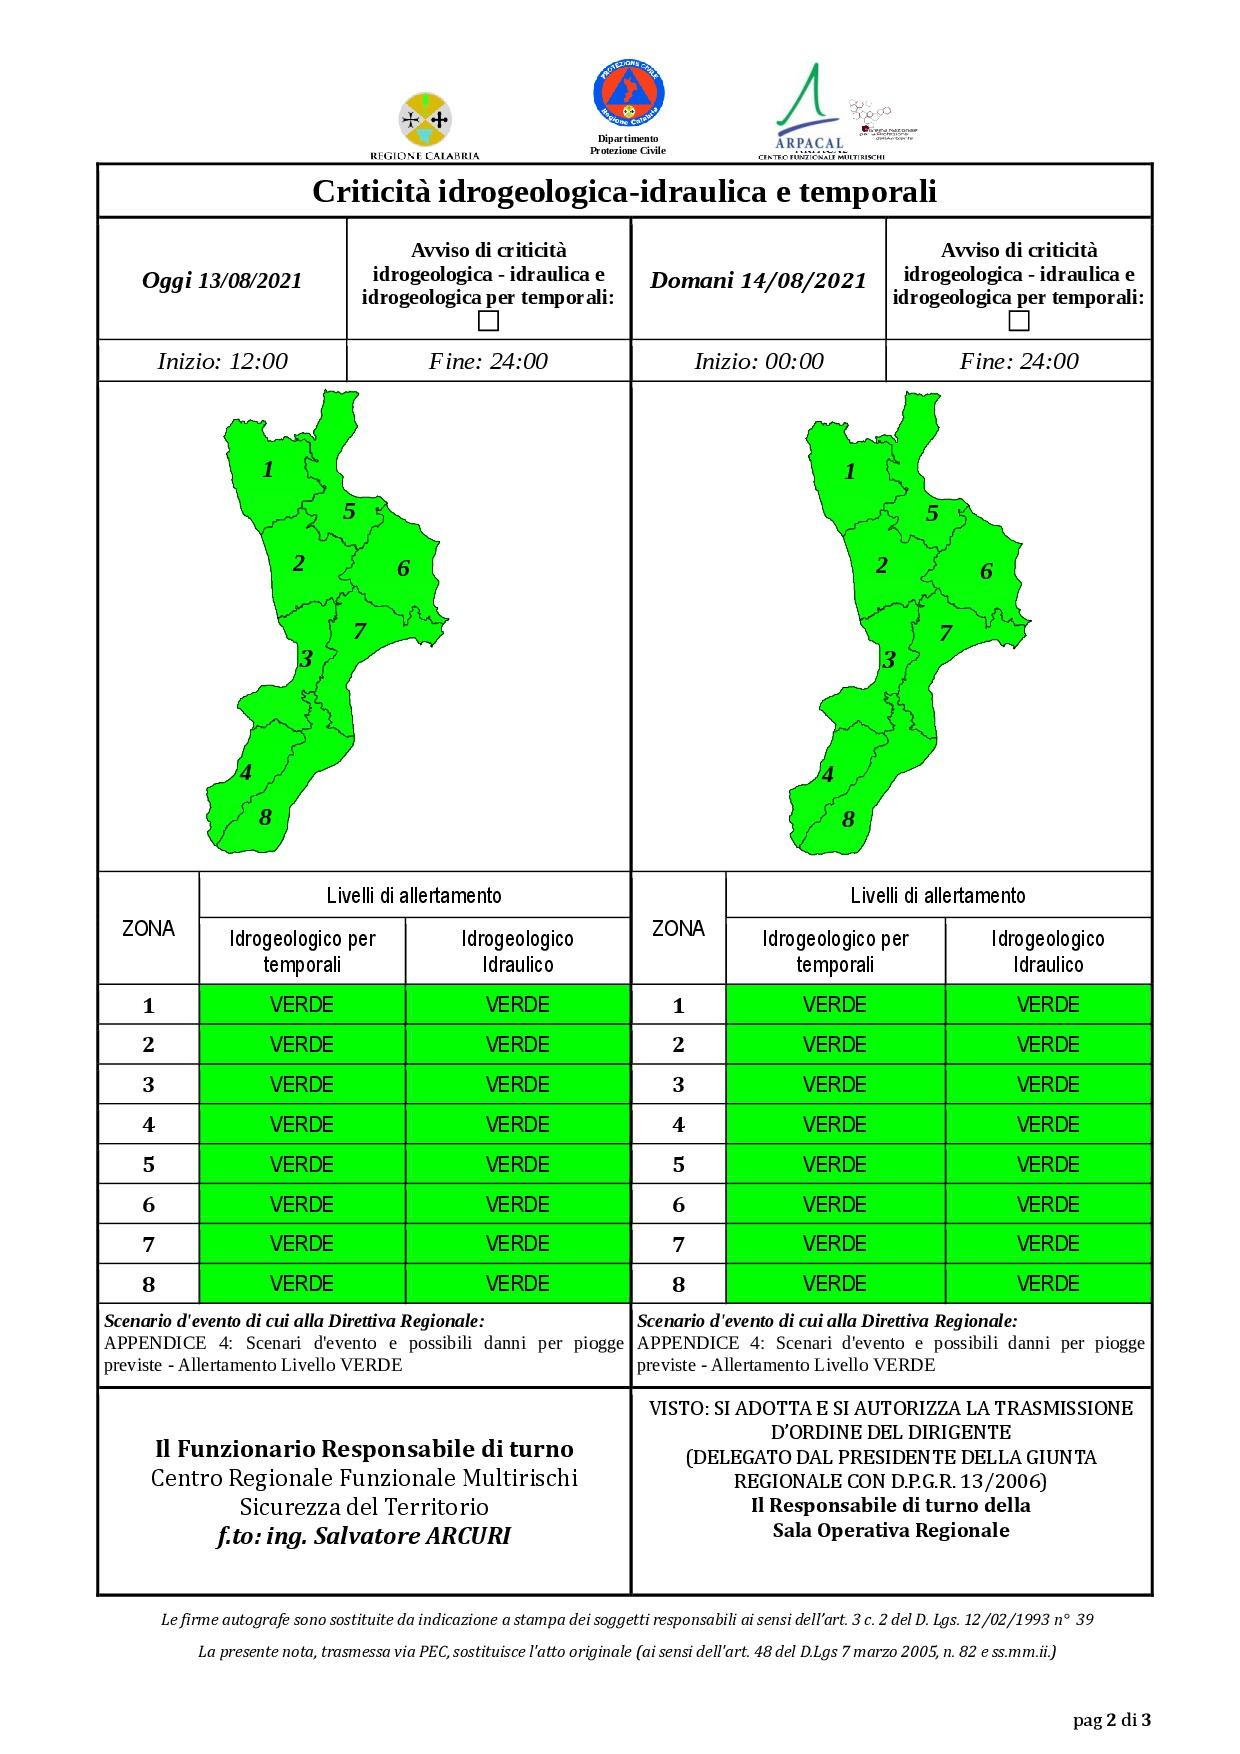 Criticità idrogeologica-idraulica e temporali in Calabria 13-08-2021